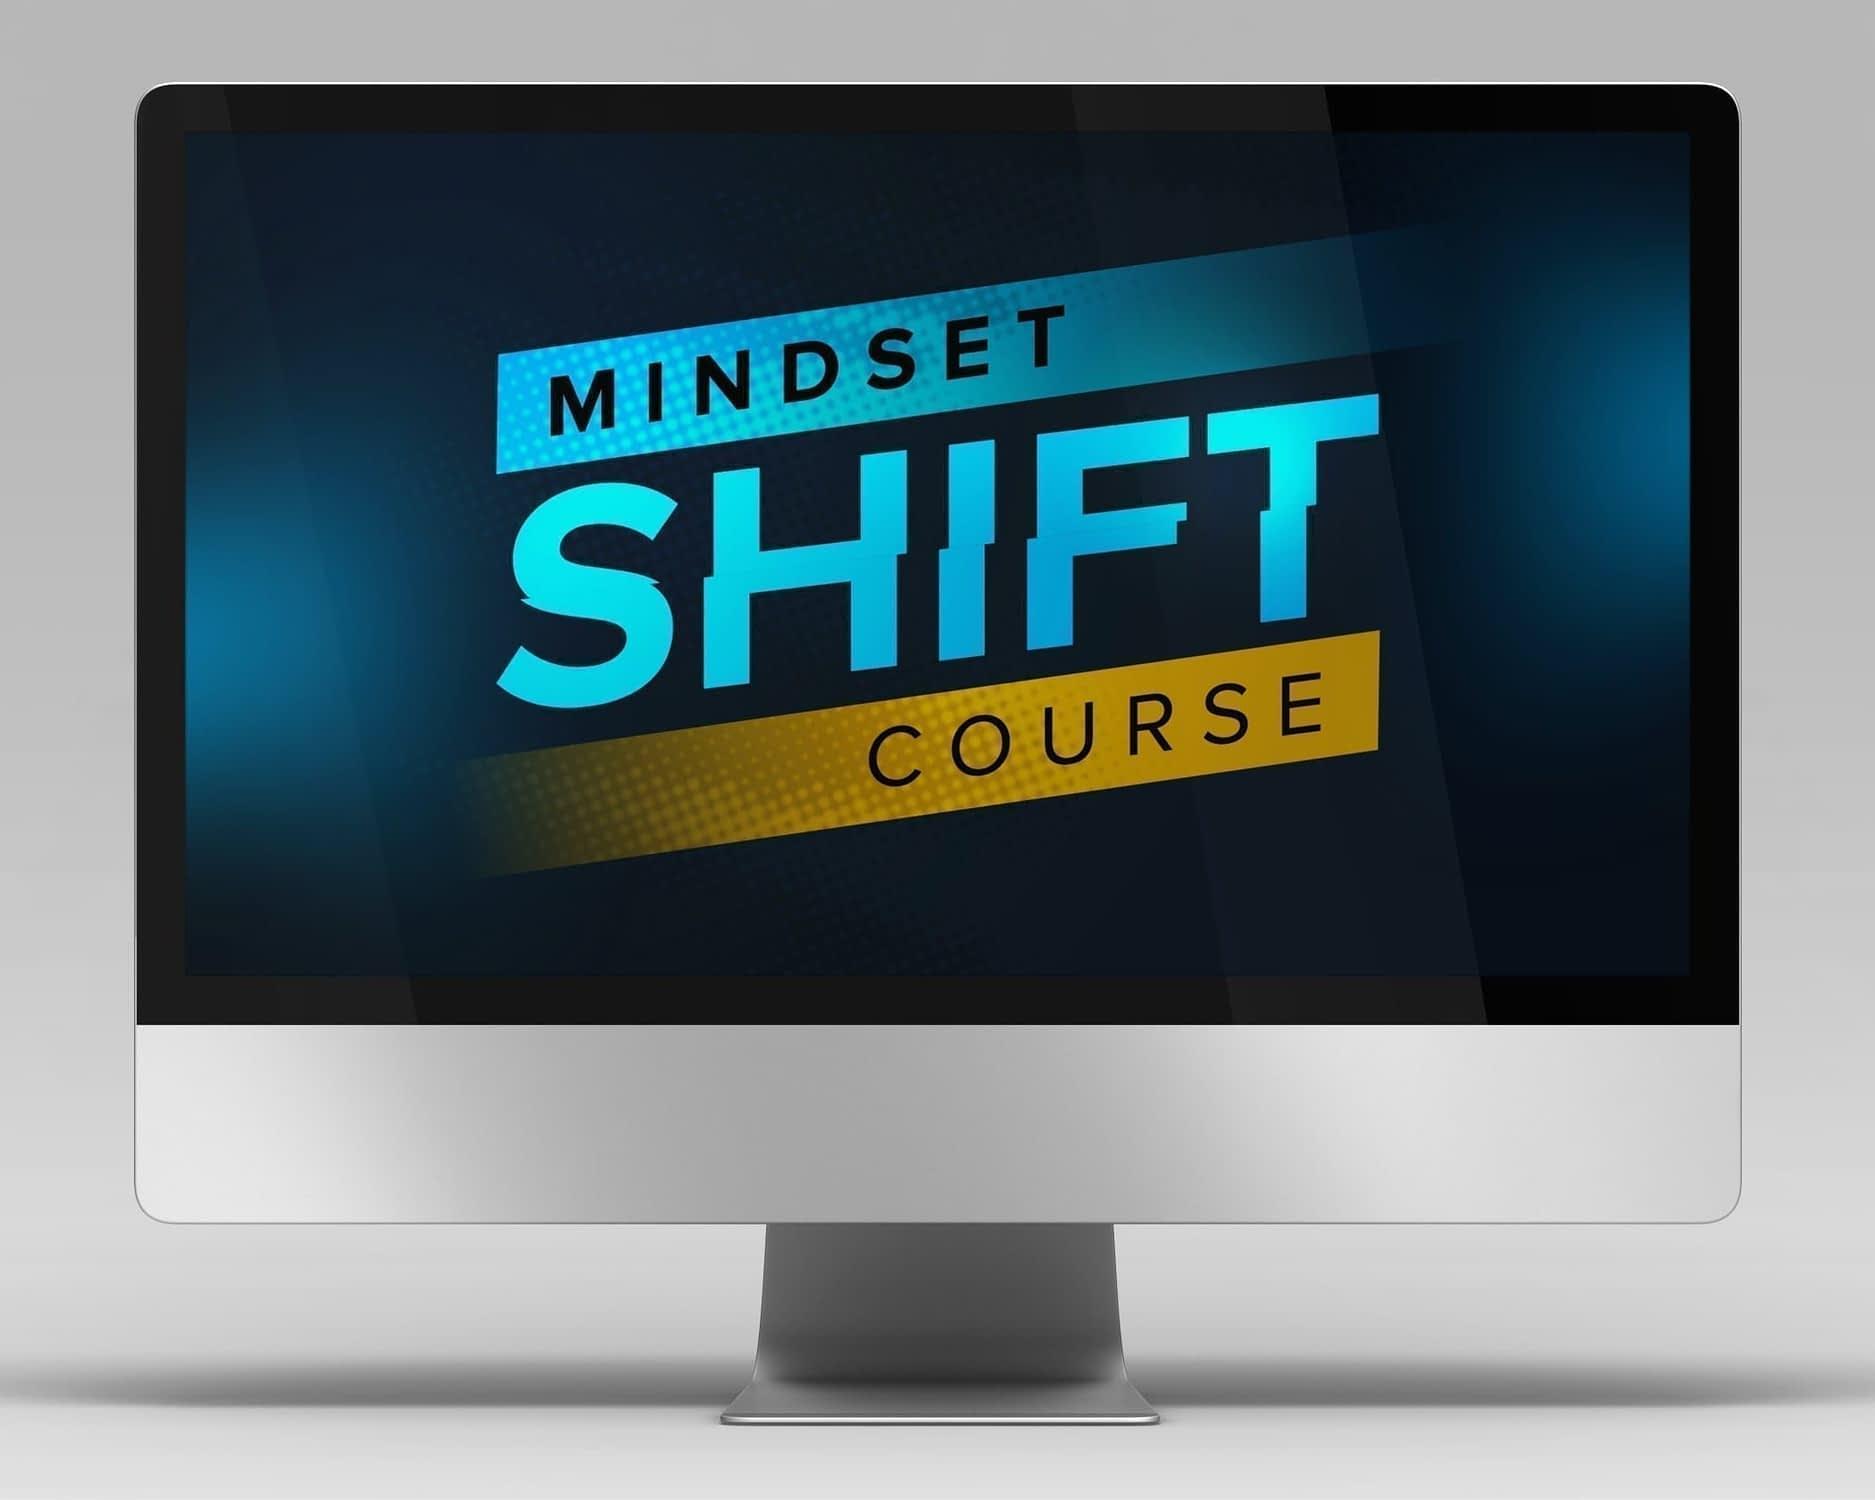 MIndset-Shift-Course-min-1